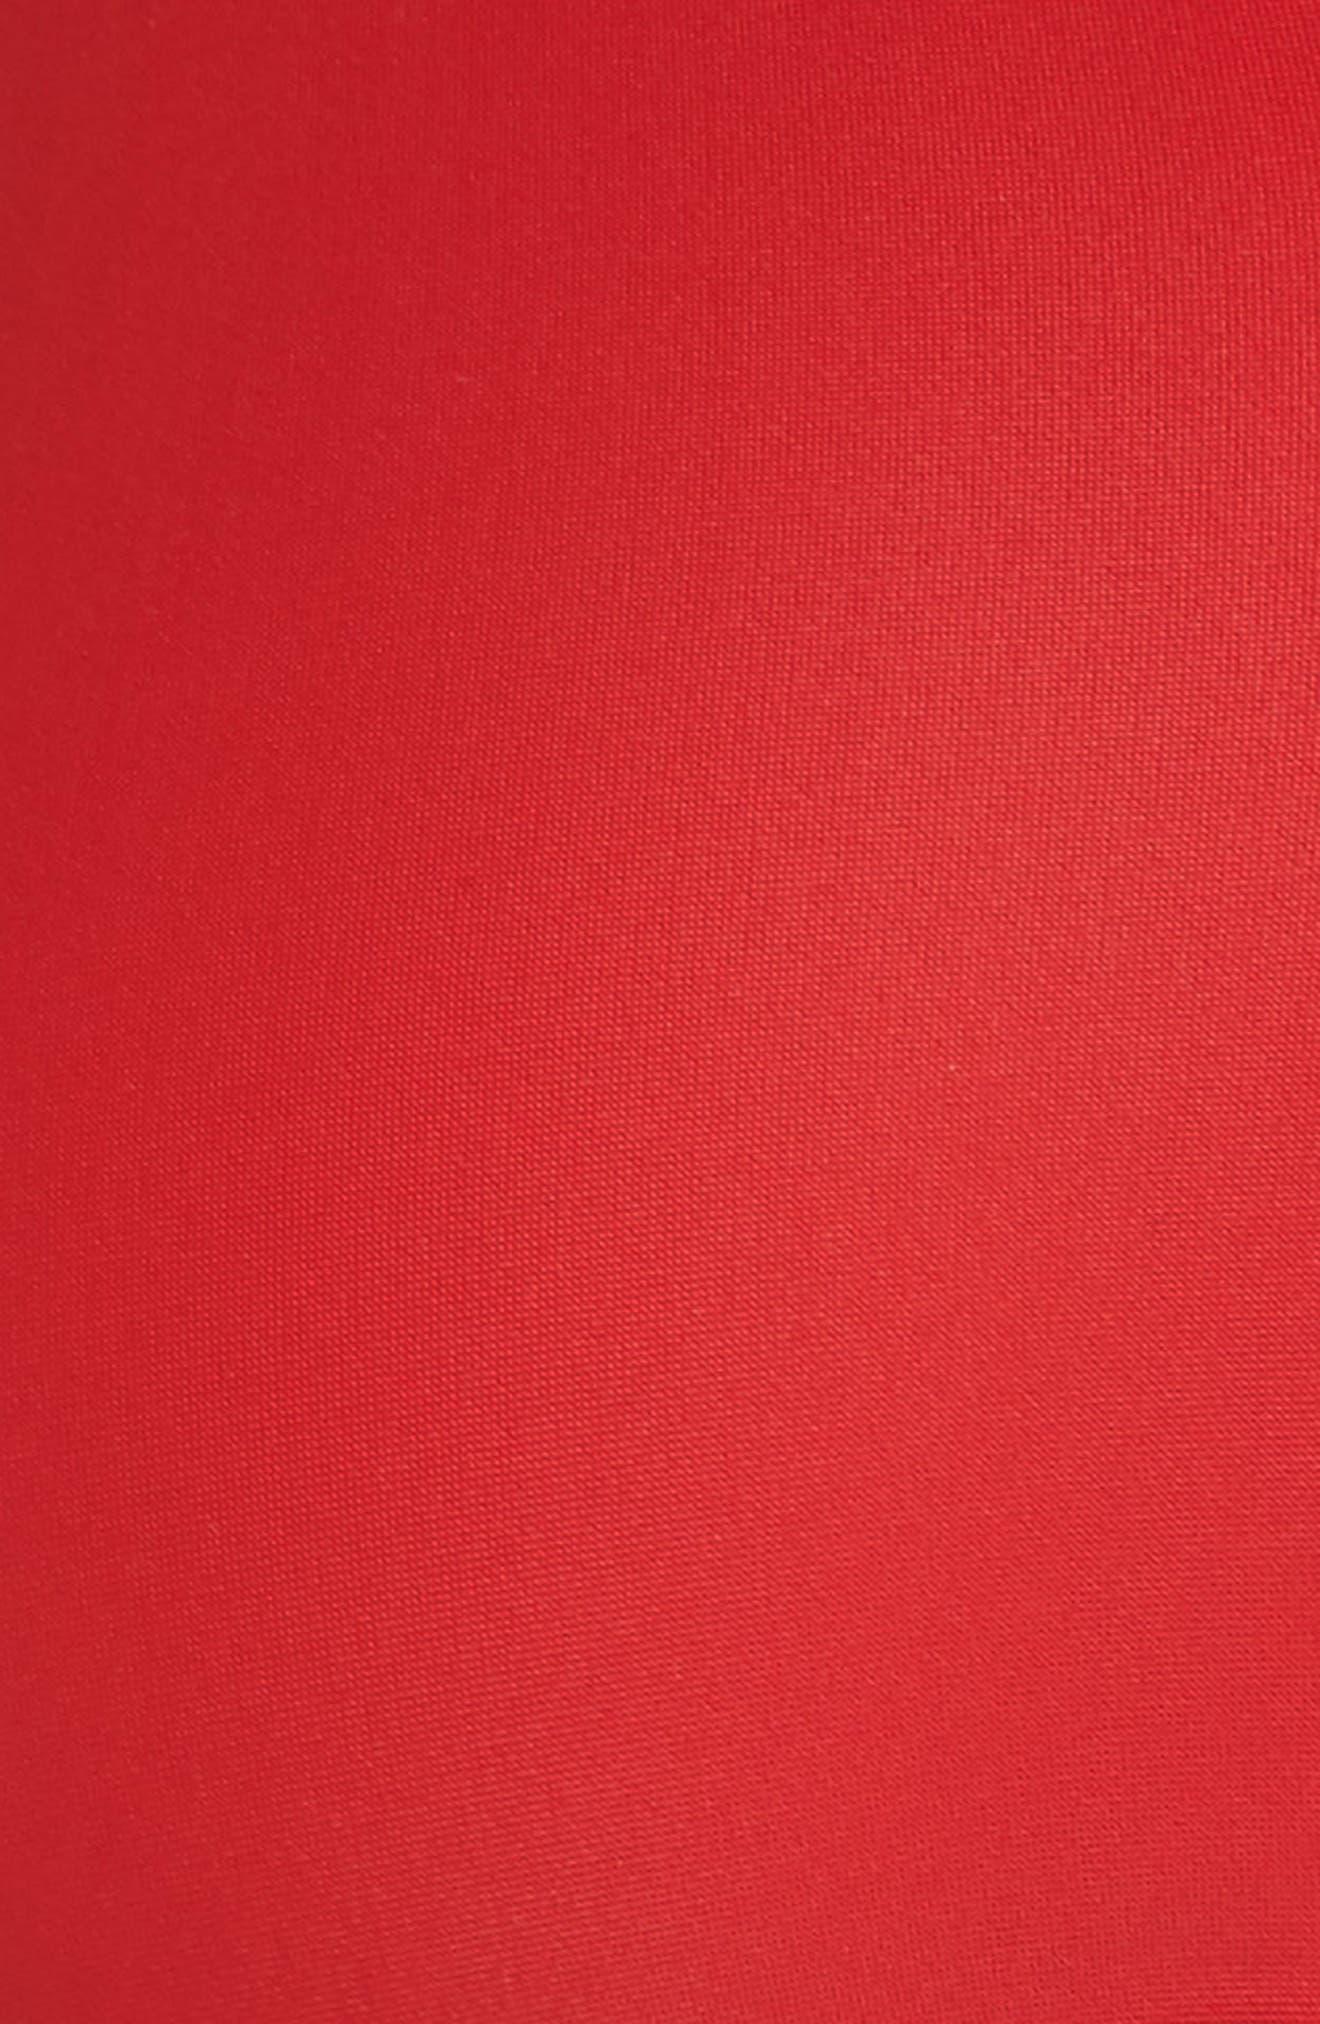 Launch Bikini Top,                             Alternate thumbnail 5, color,                             Red/ Black/ Orange